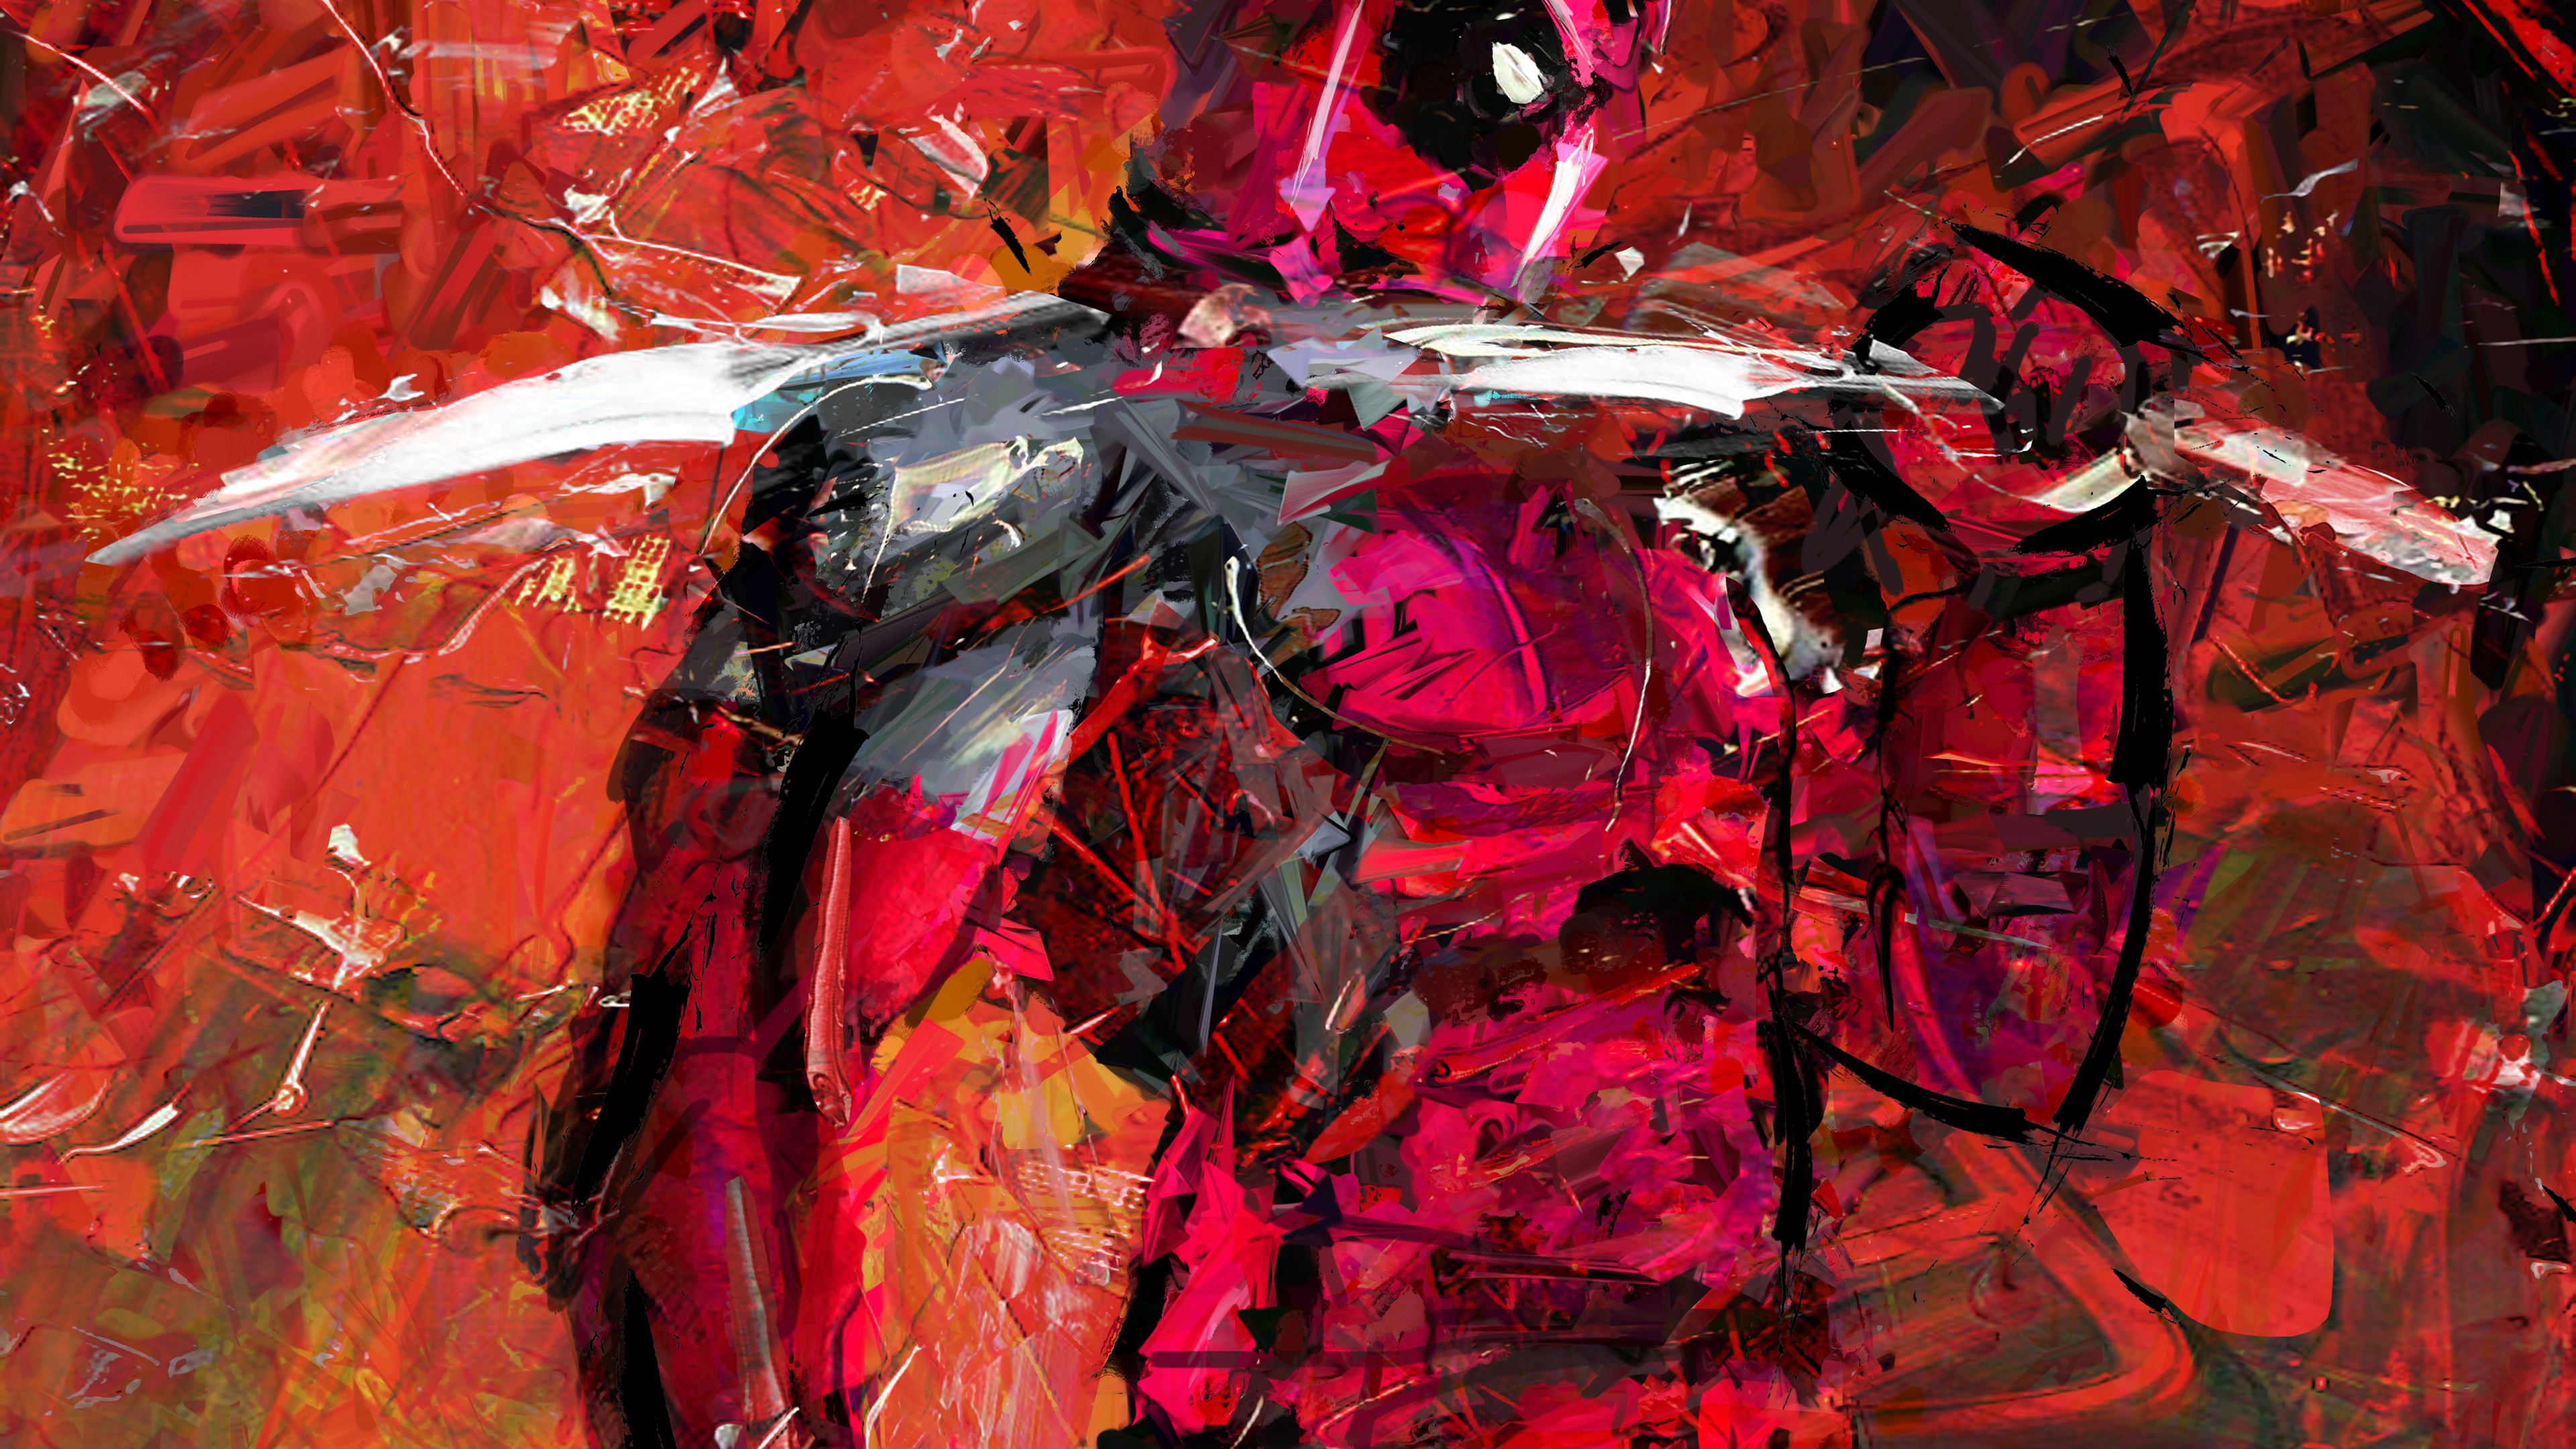 deadpool 10k 1536523577 - Deadpool 10k - superheroes wallpapers, portrait wallpapers, digital art wallpapers, deadpool wallpapers, artwork wallpapers, art wallpapers, 10k wallpapers